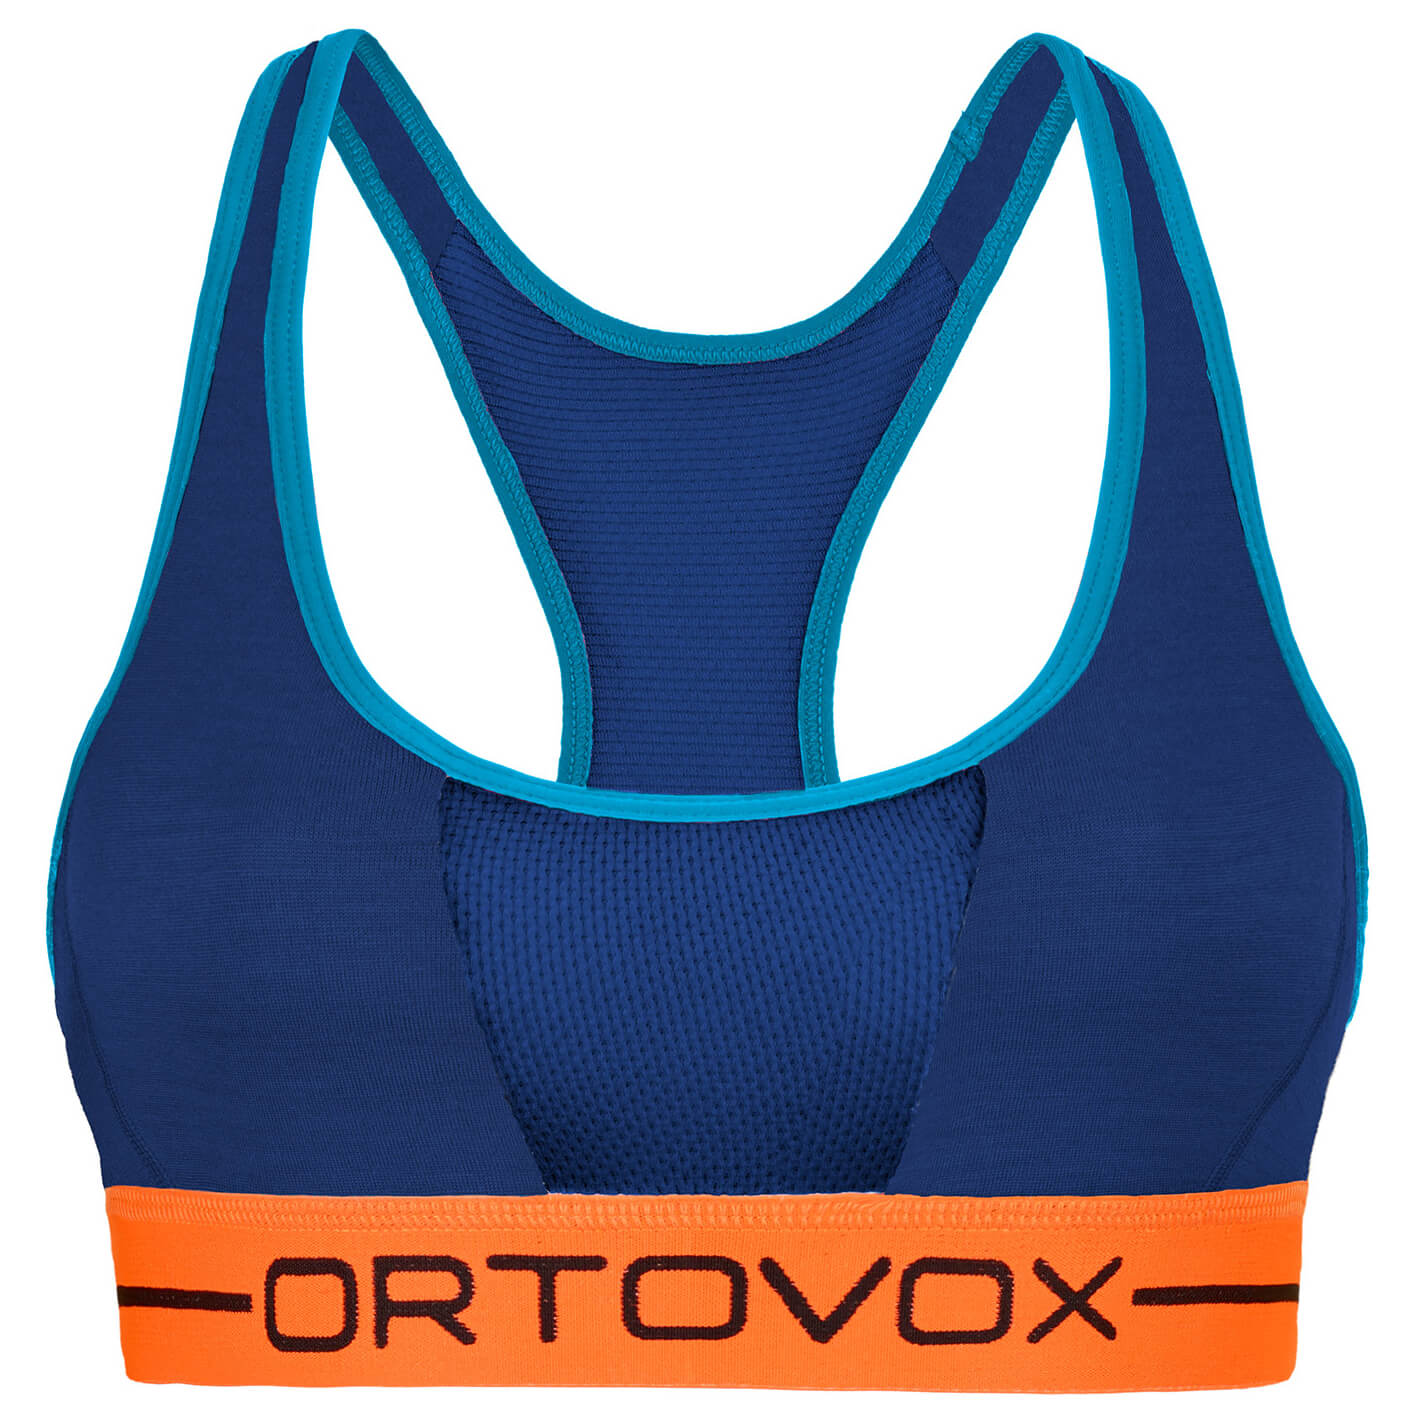 ortovox r 39 n 39 w sport top sport bh damen online kaufen. Black Bedroom Furniture Sets. Home Design Ideas